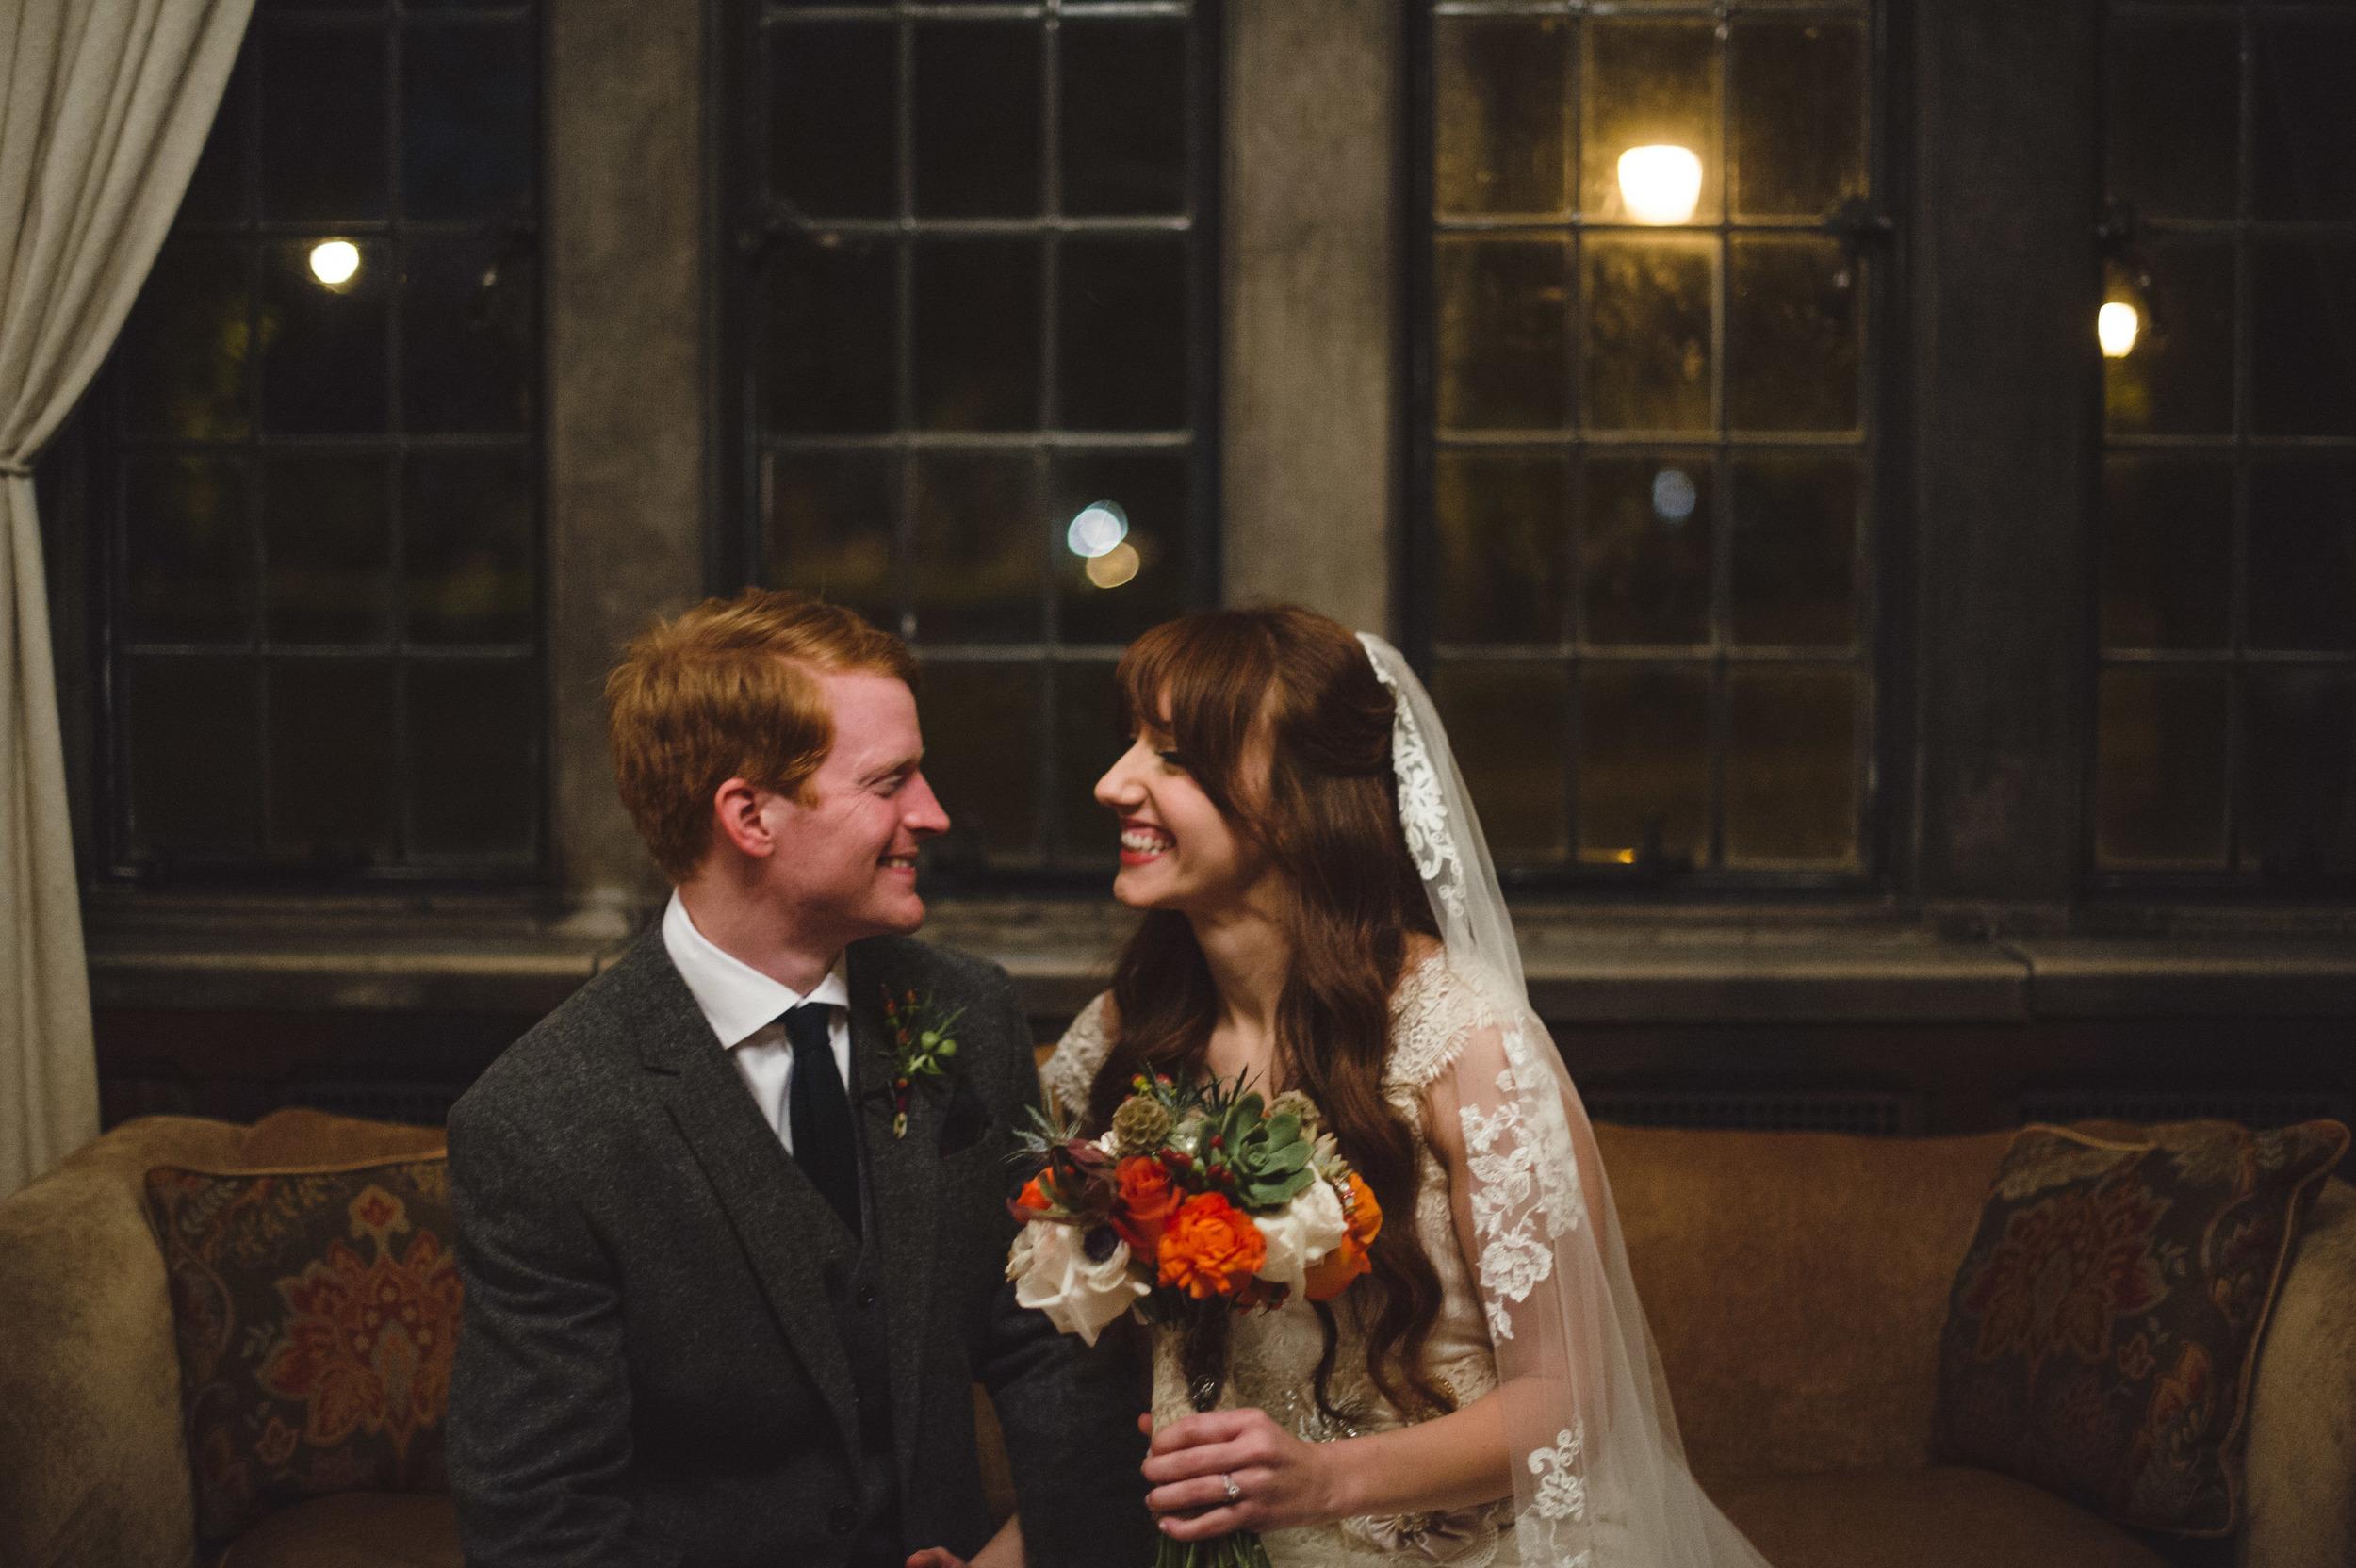 Autumn Bride and Groom